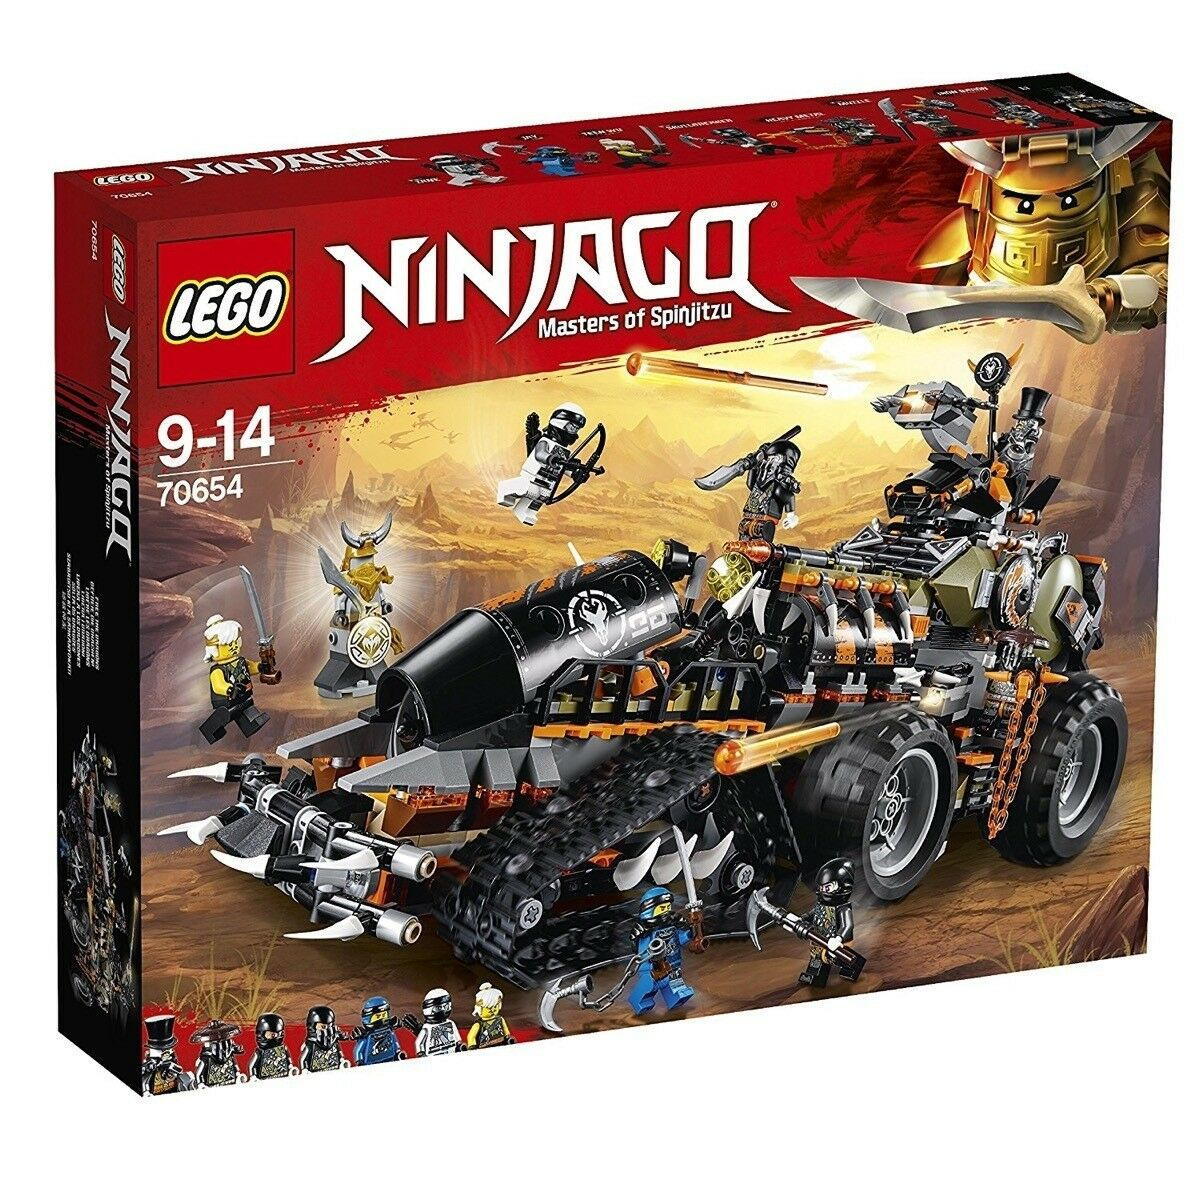 LEGO NINJAGO TURBO CINGOLATO - LEGO 70654